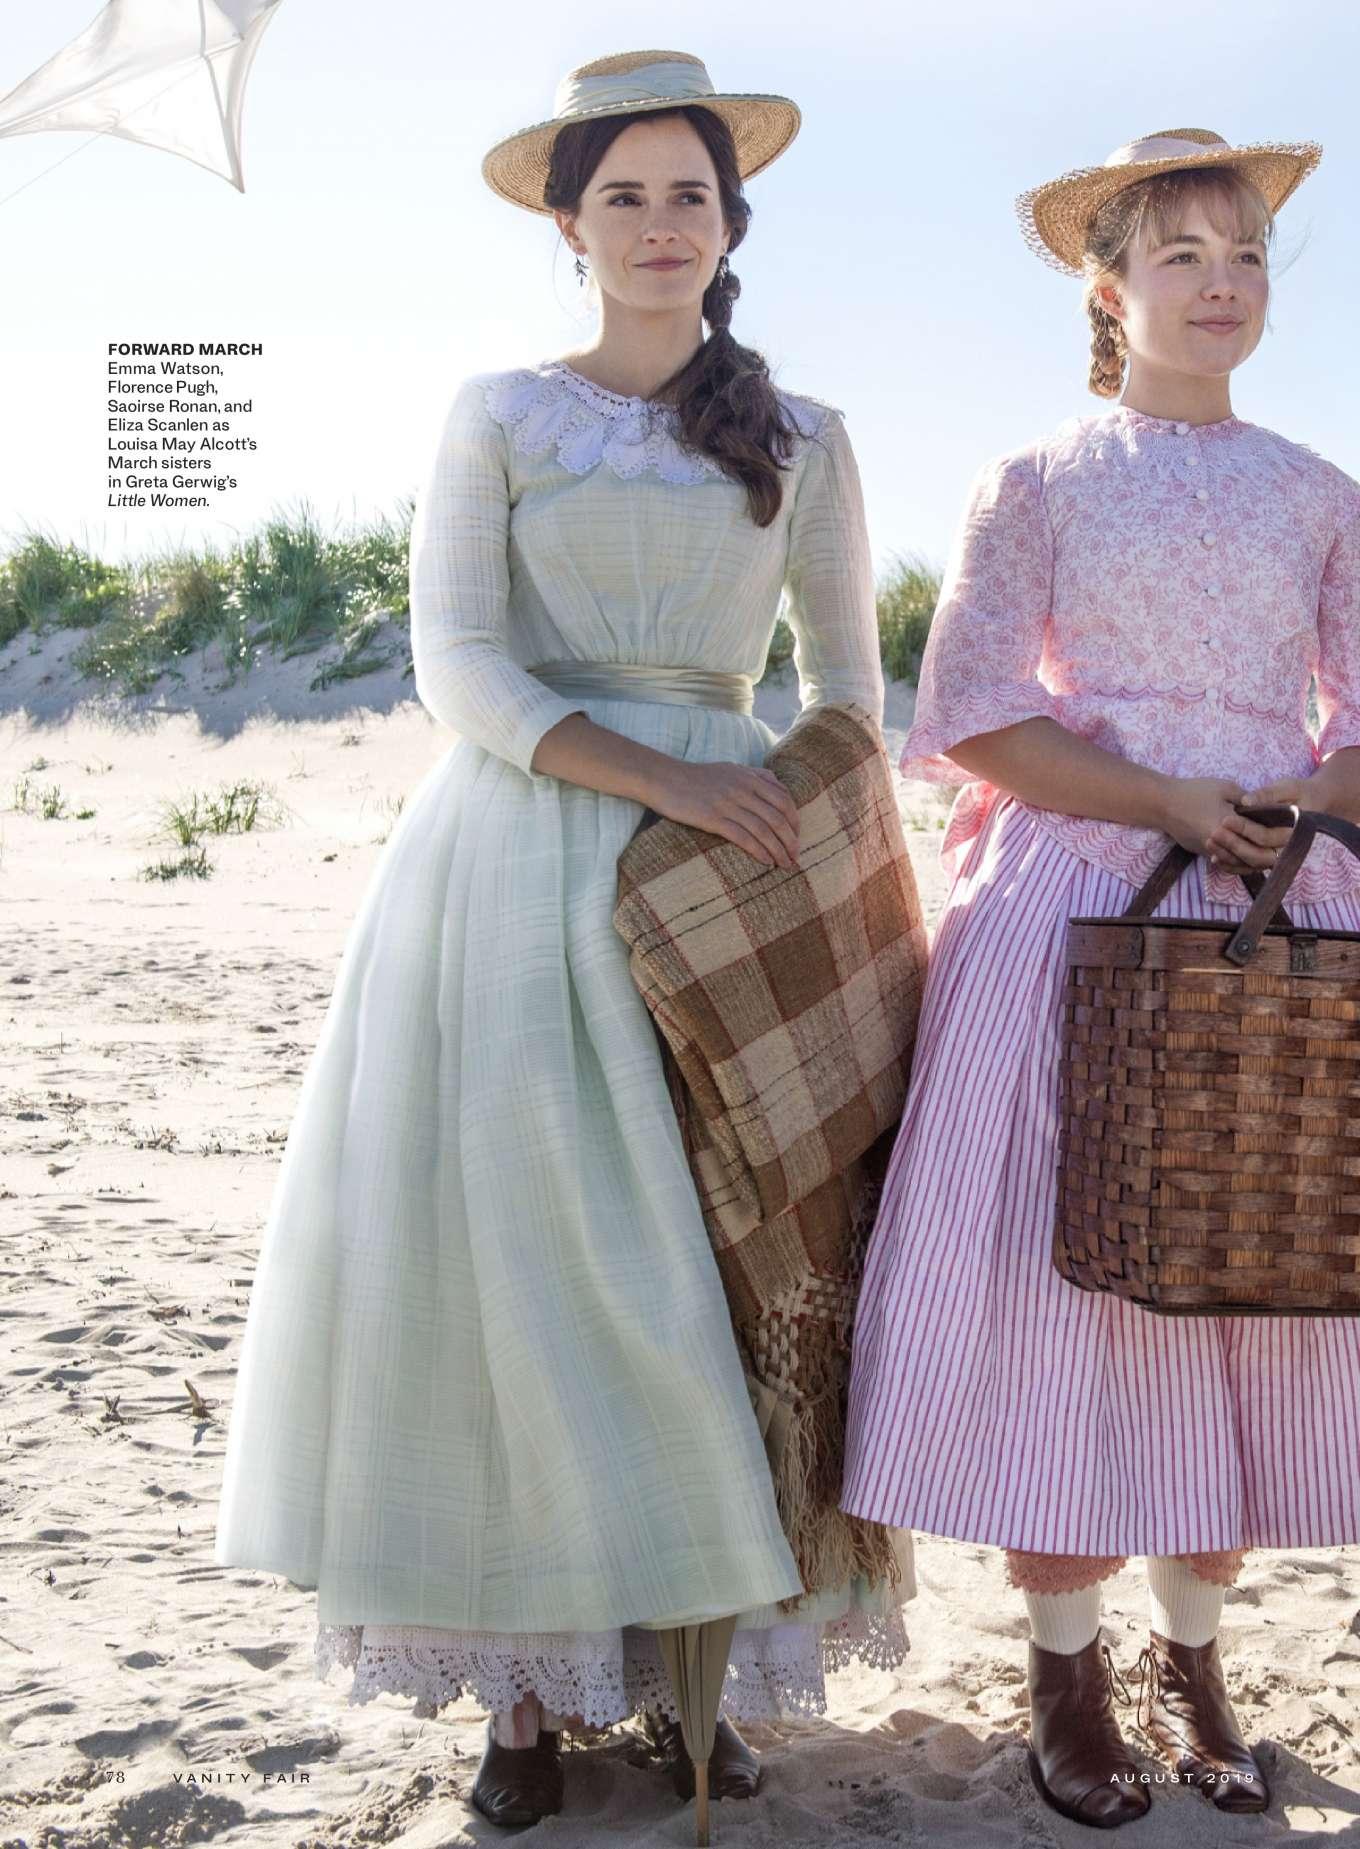 Emma Watson - Vanity Fair August 2019